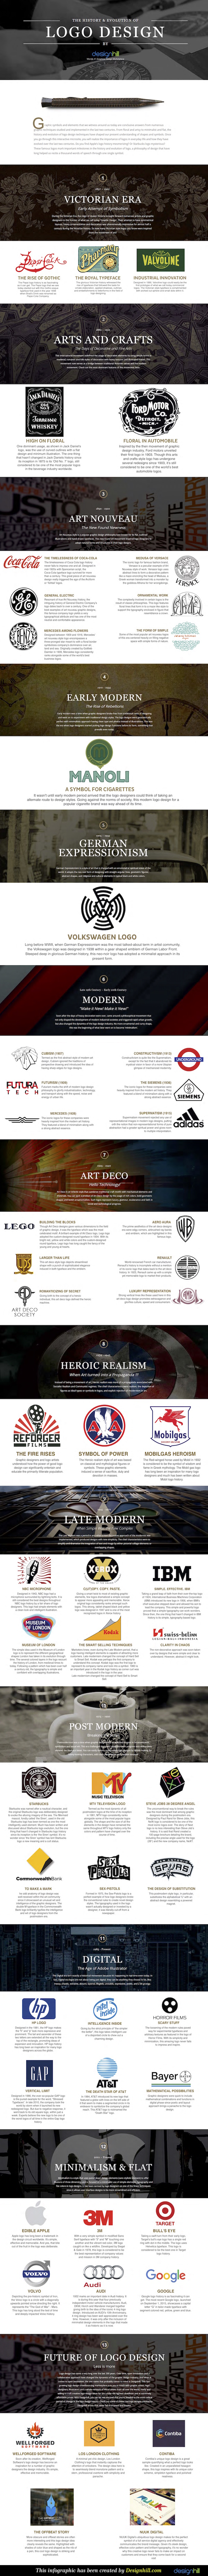 history-logo-design.jpg